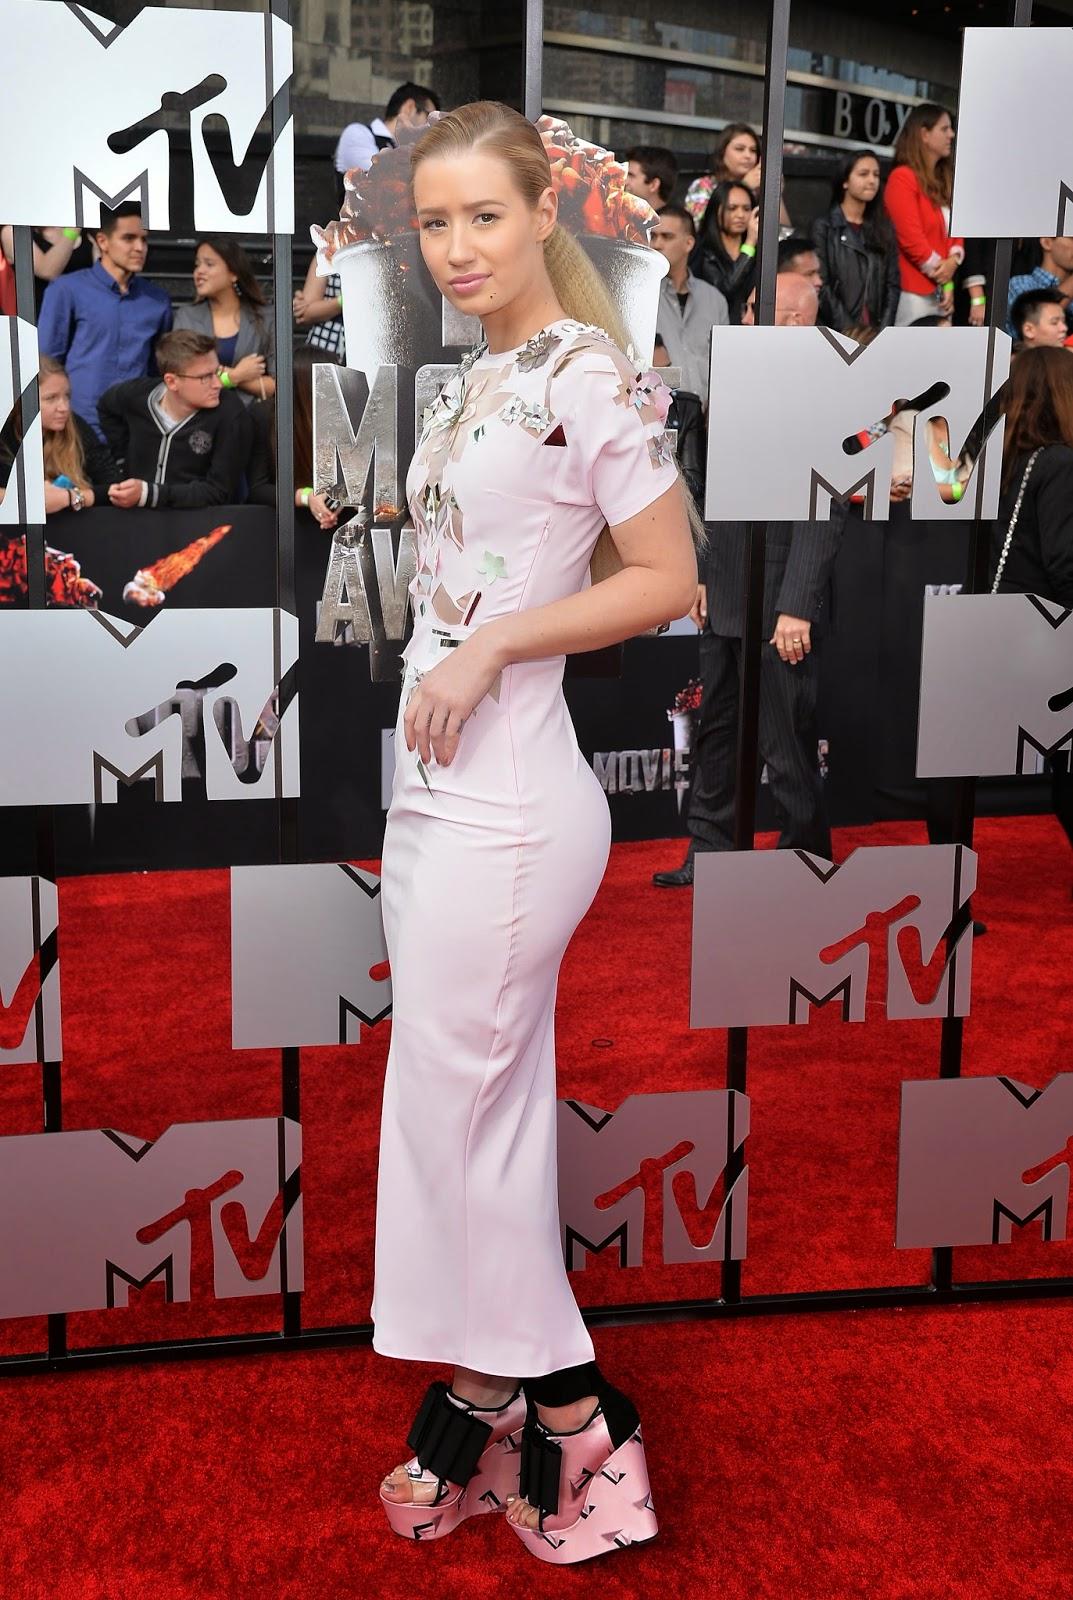 Iggy Azalea - Celebrity Fakes Forum | FamousBoard.com